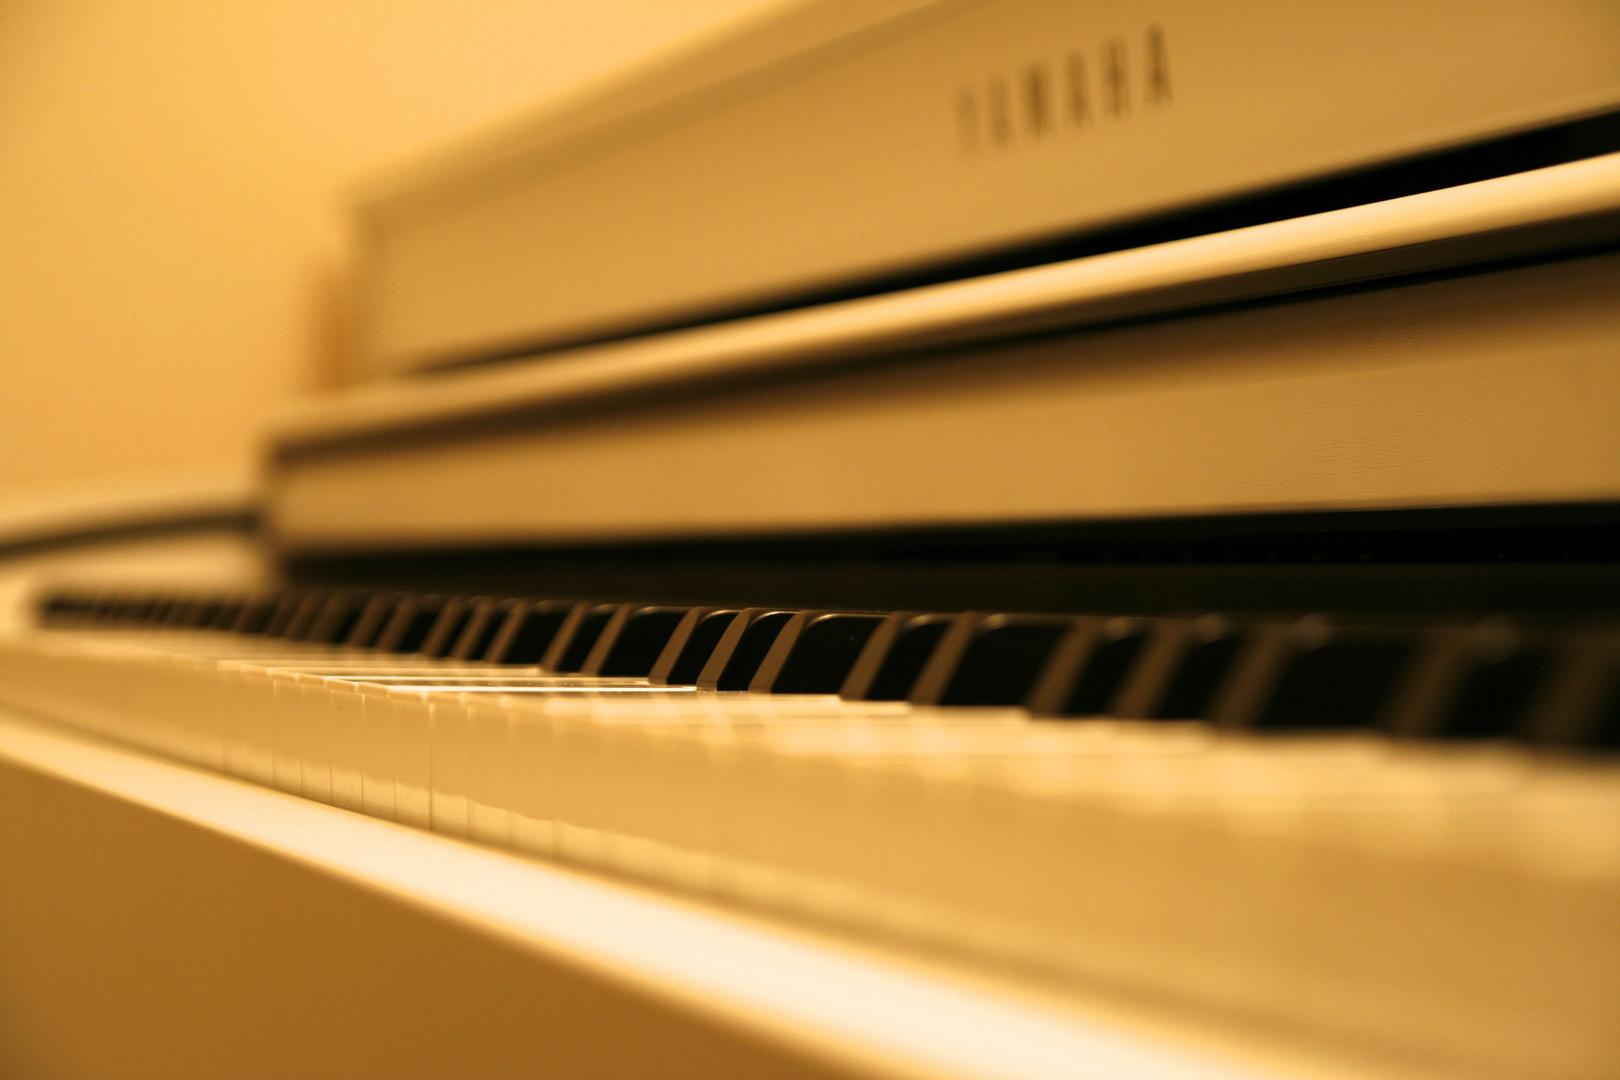 Wohltemperiertes Klavier